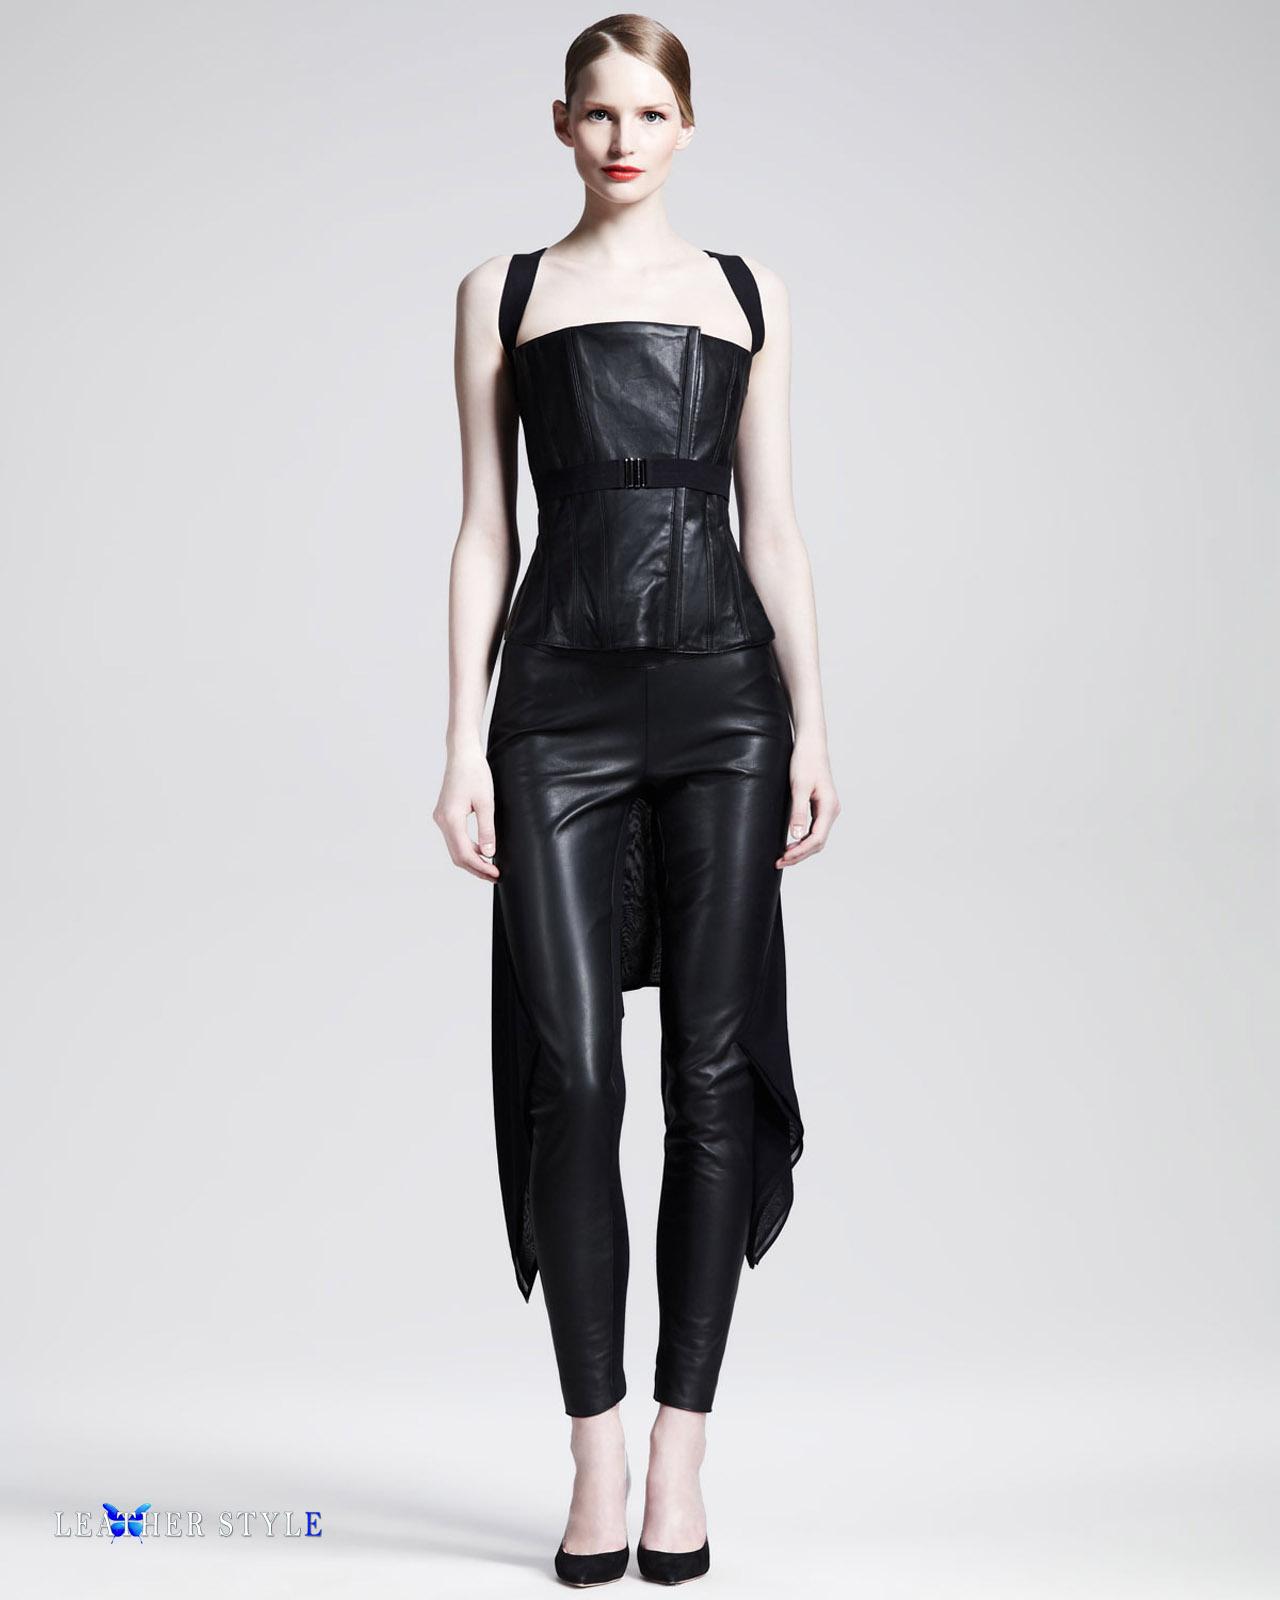 Leather Style Latex Couture Vinyl Fashion Designers Photographers Models Magazines